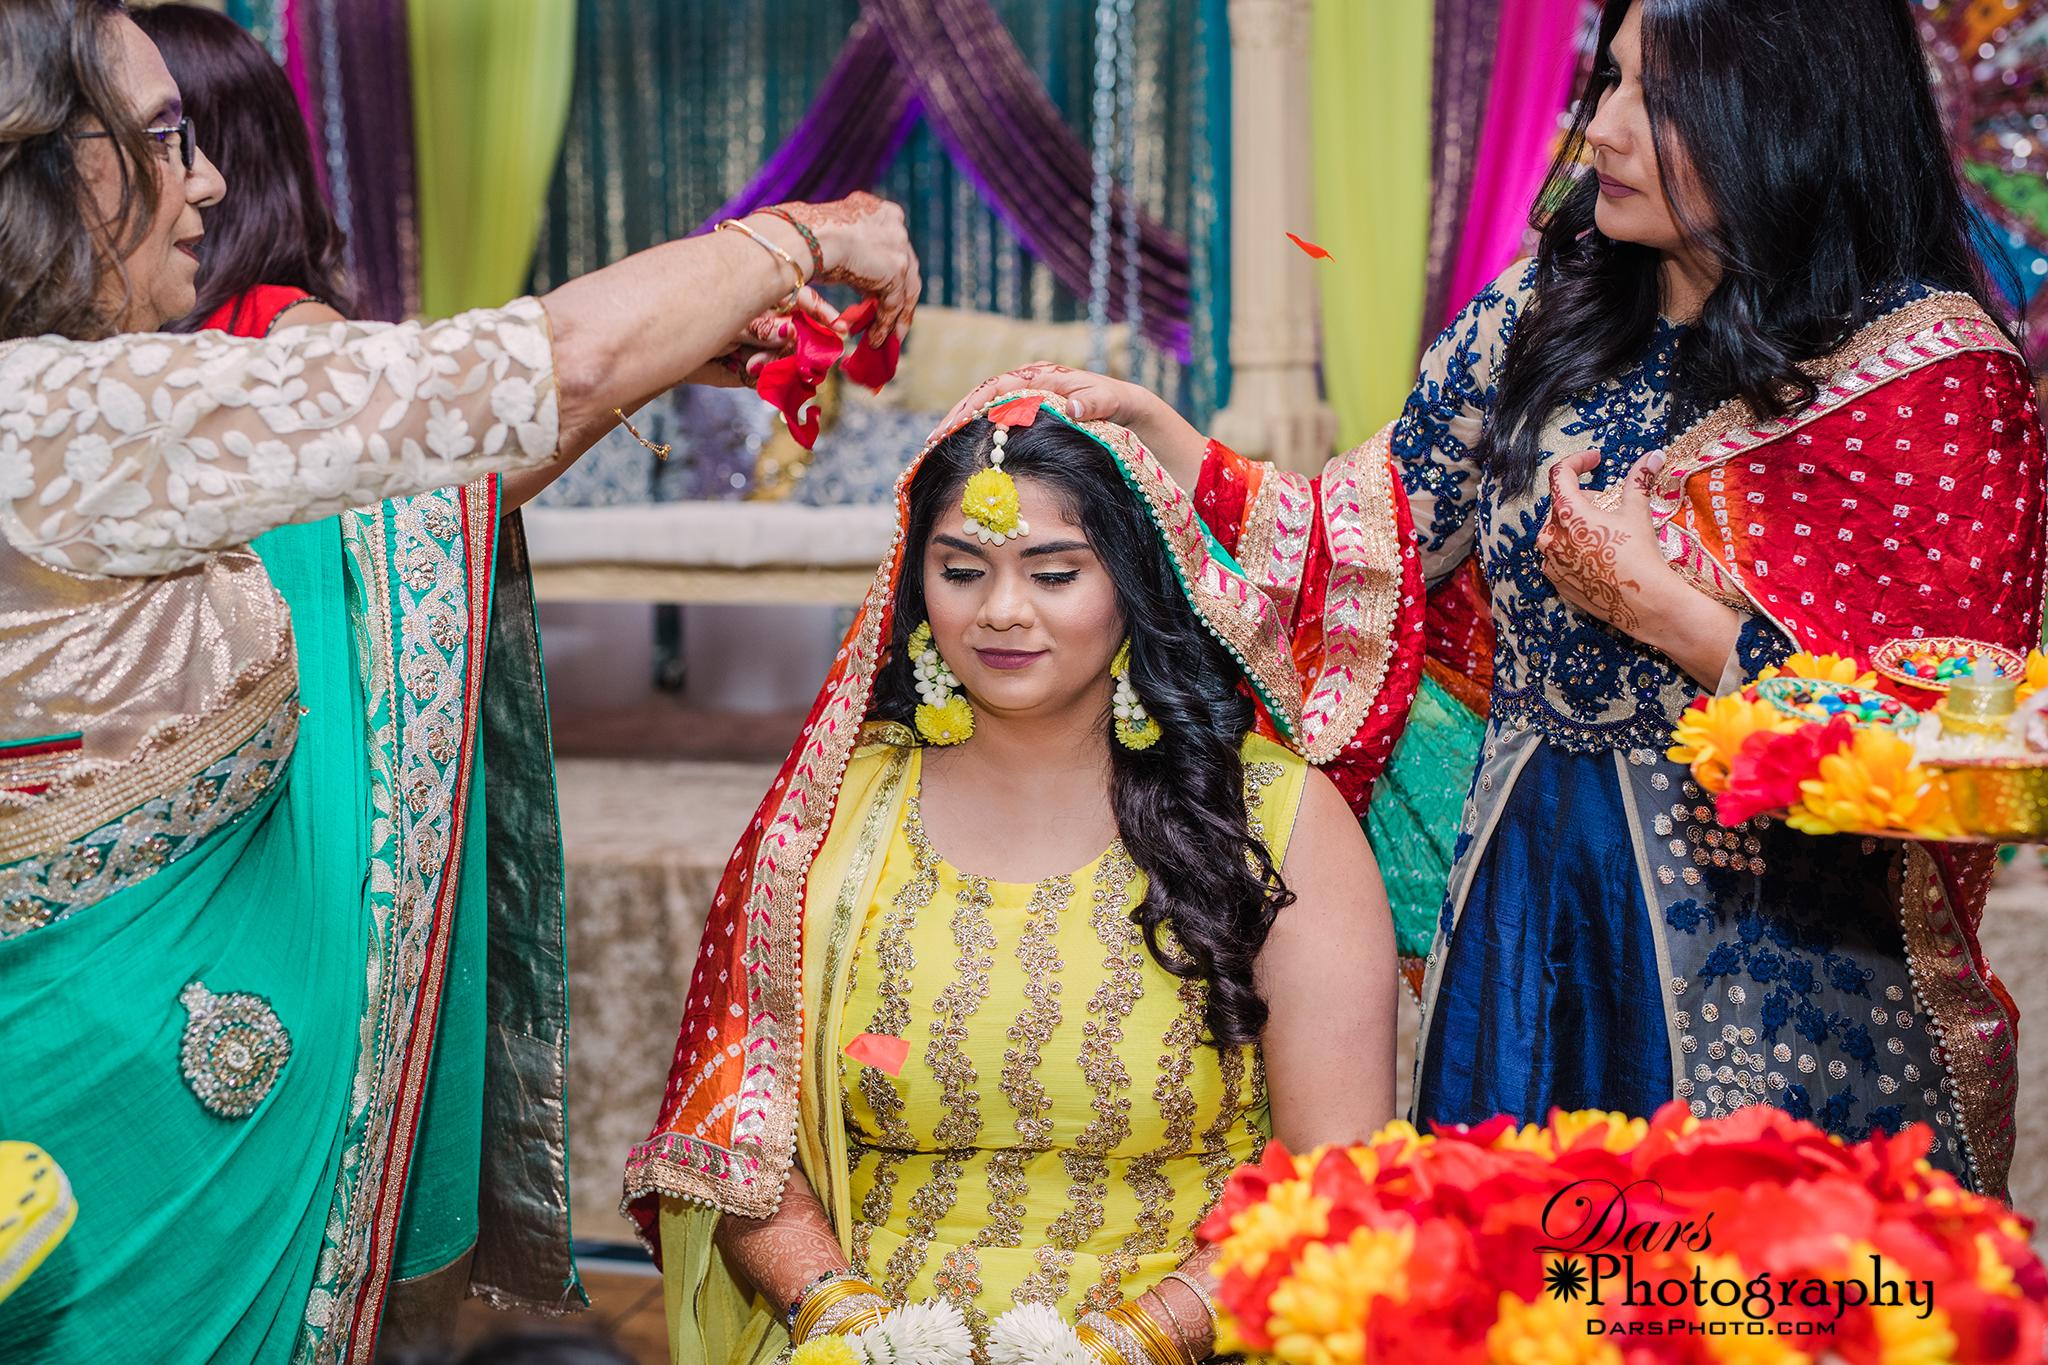 Pakistani Wedding (18) – DARS Photography